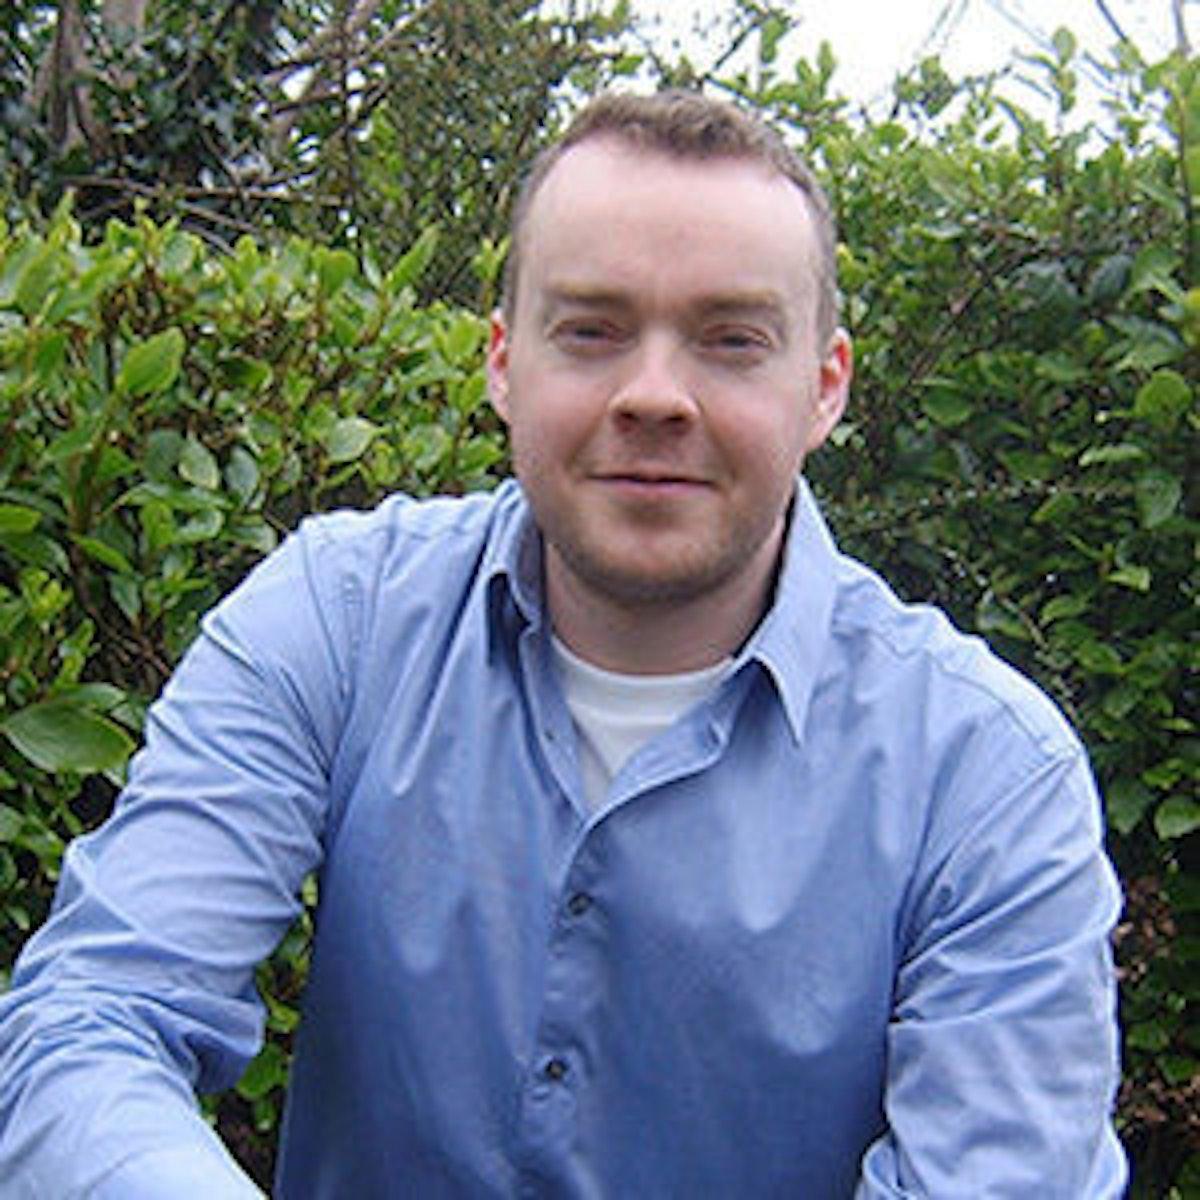 John Alex Clark